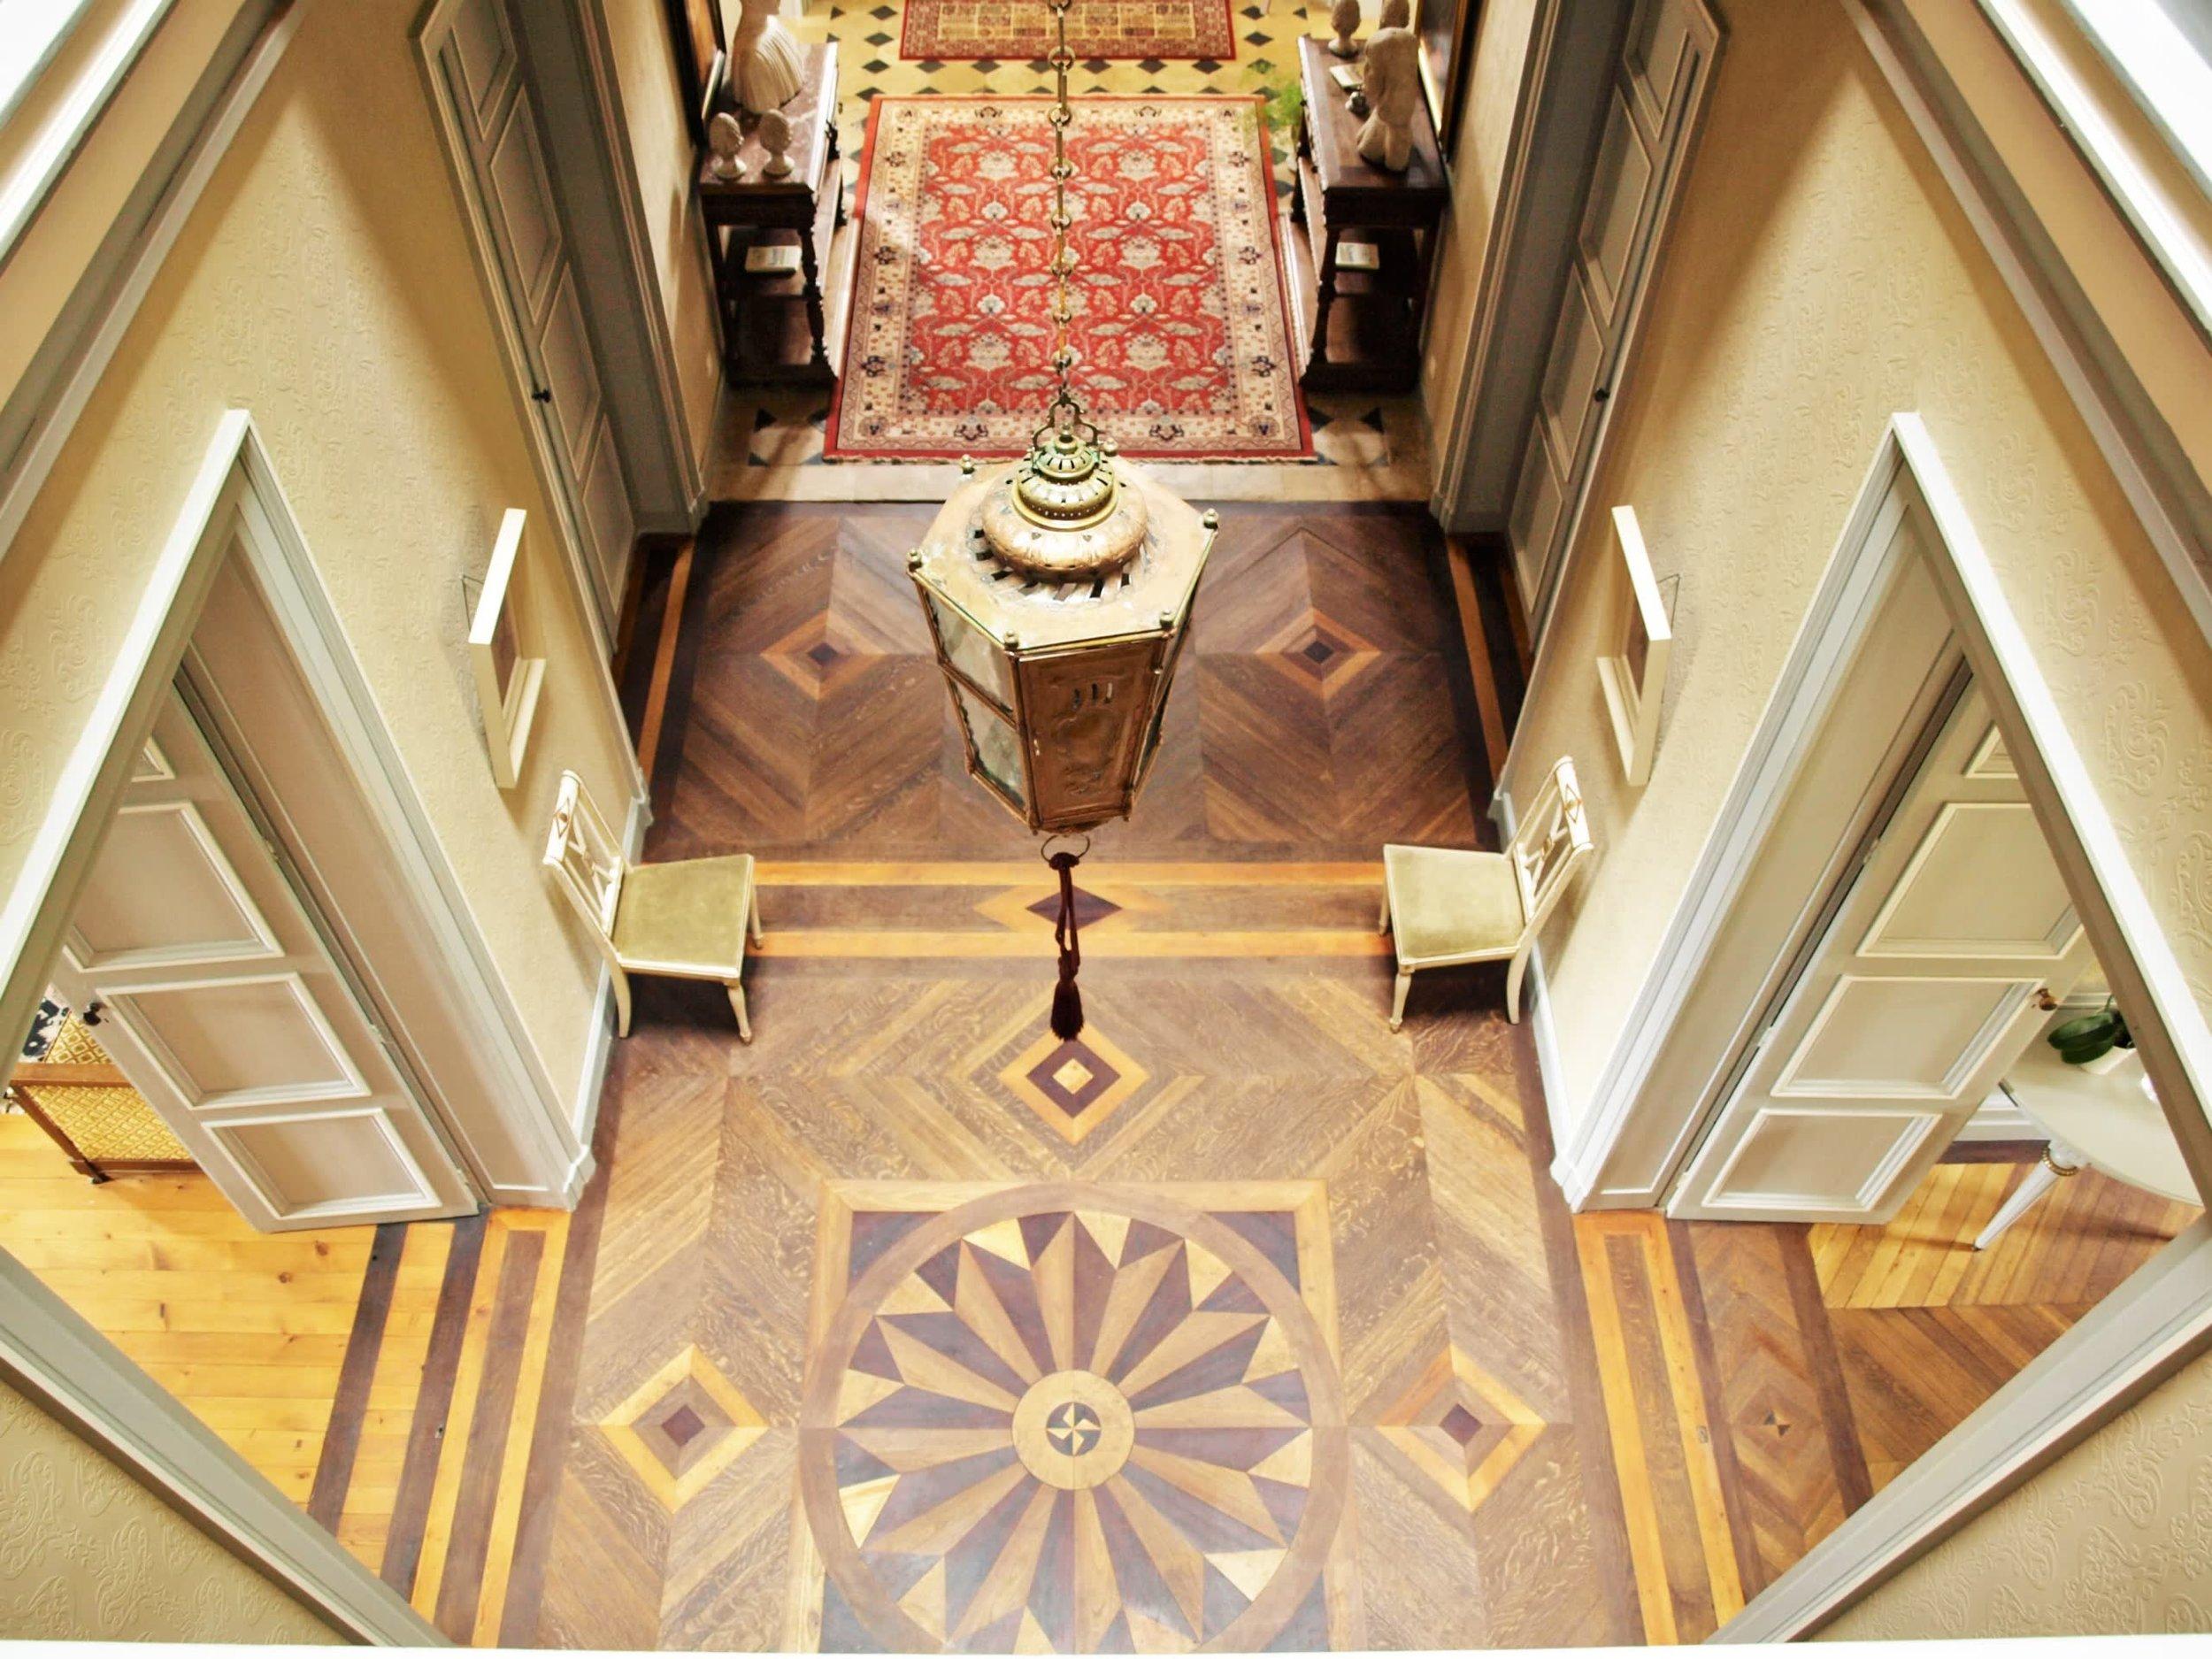 Chateau de la Pommeraye - charming boutique hotel chateau b&b spa normandy calvados Atrium(1).jpg